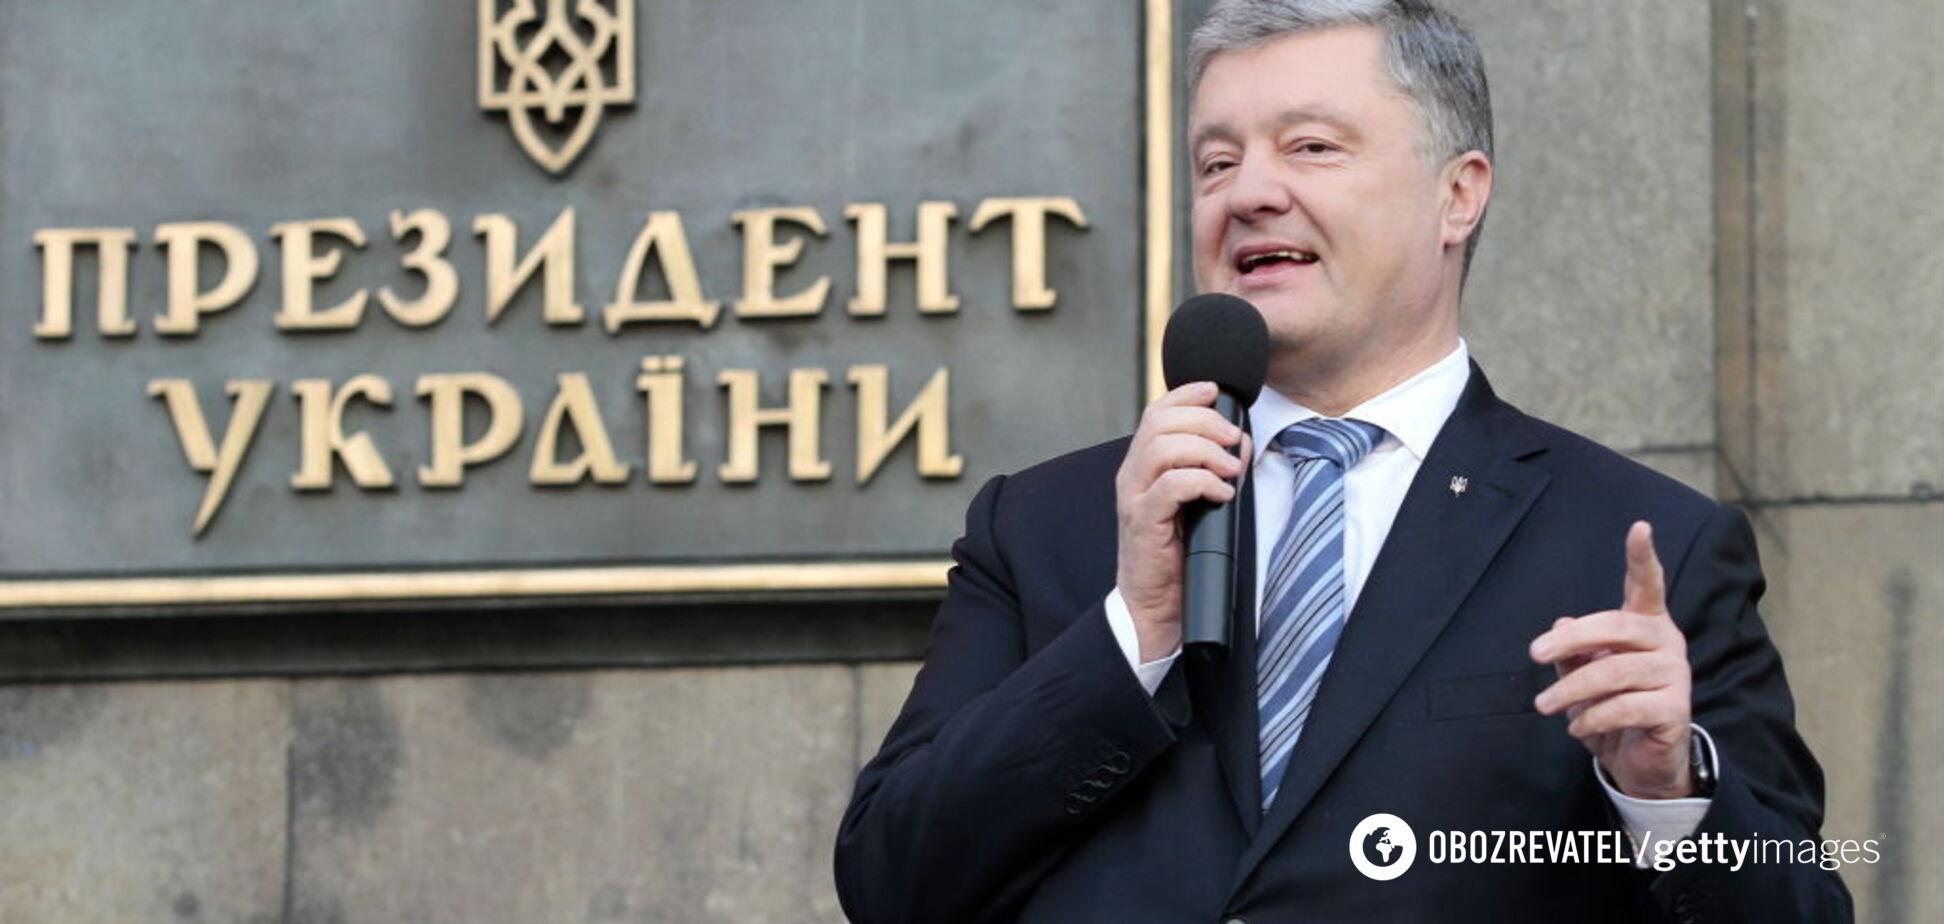 Петро Порошенко програв заслужено